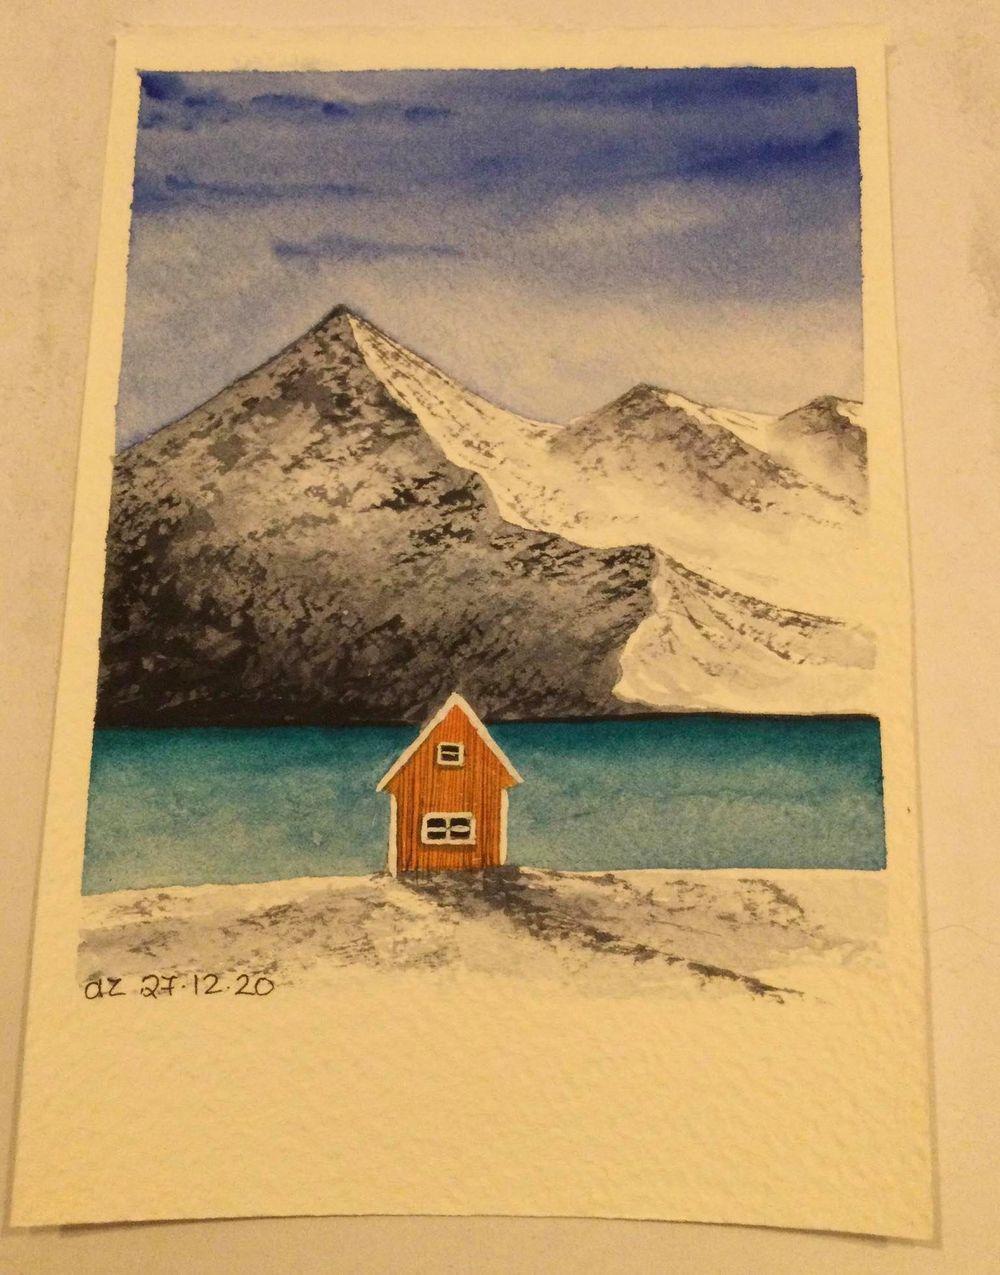 winter polaroids - image 1 - student project